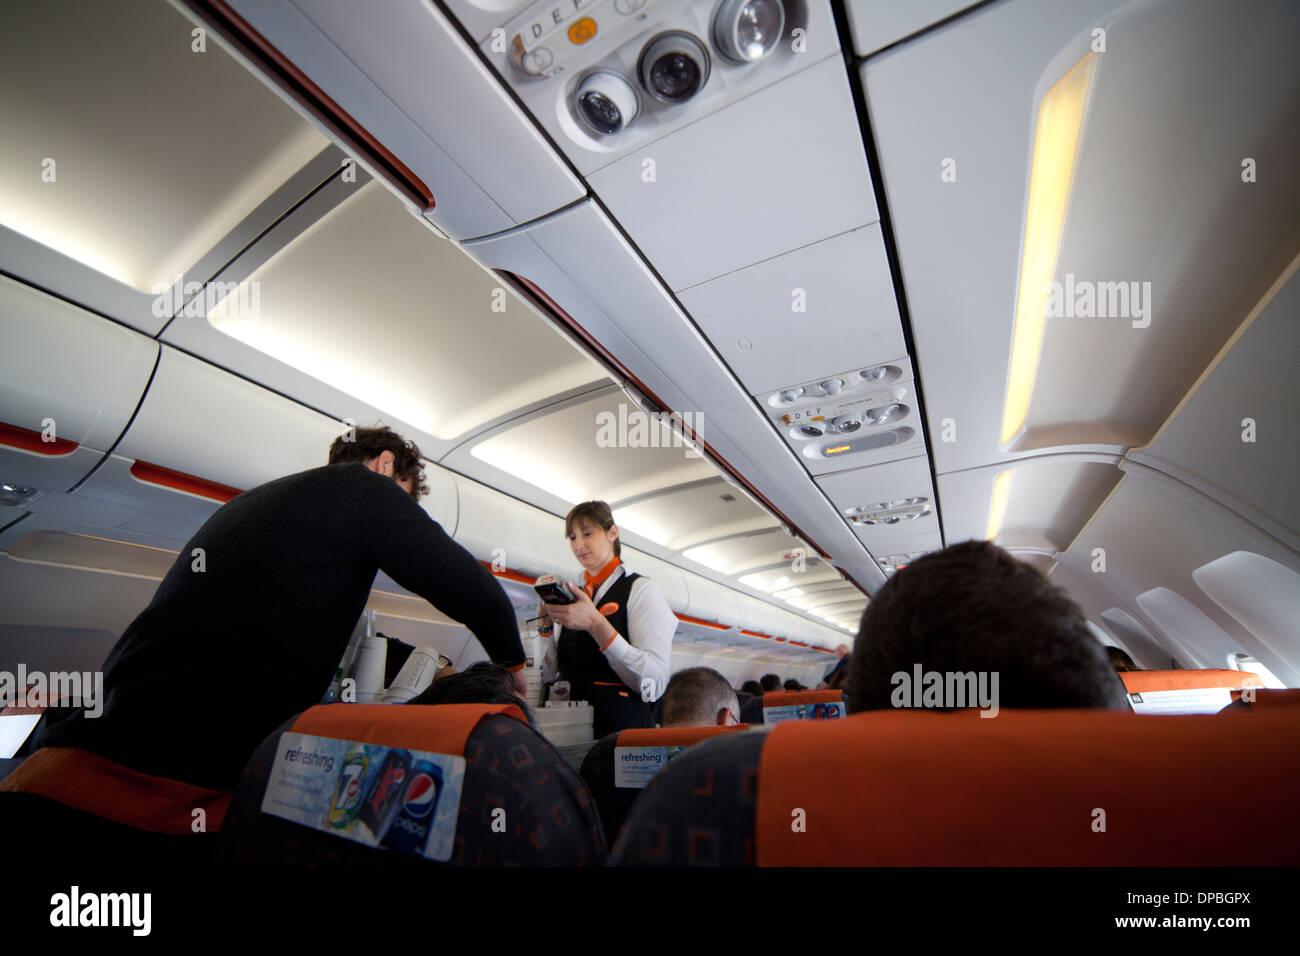 Easyjet airbus cabin crew stewardess bringing drinks to travelers - Stock Image